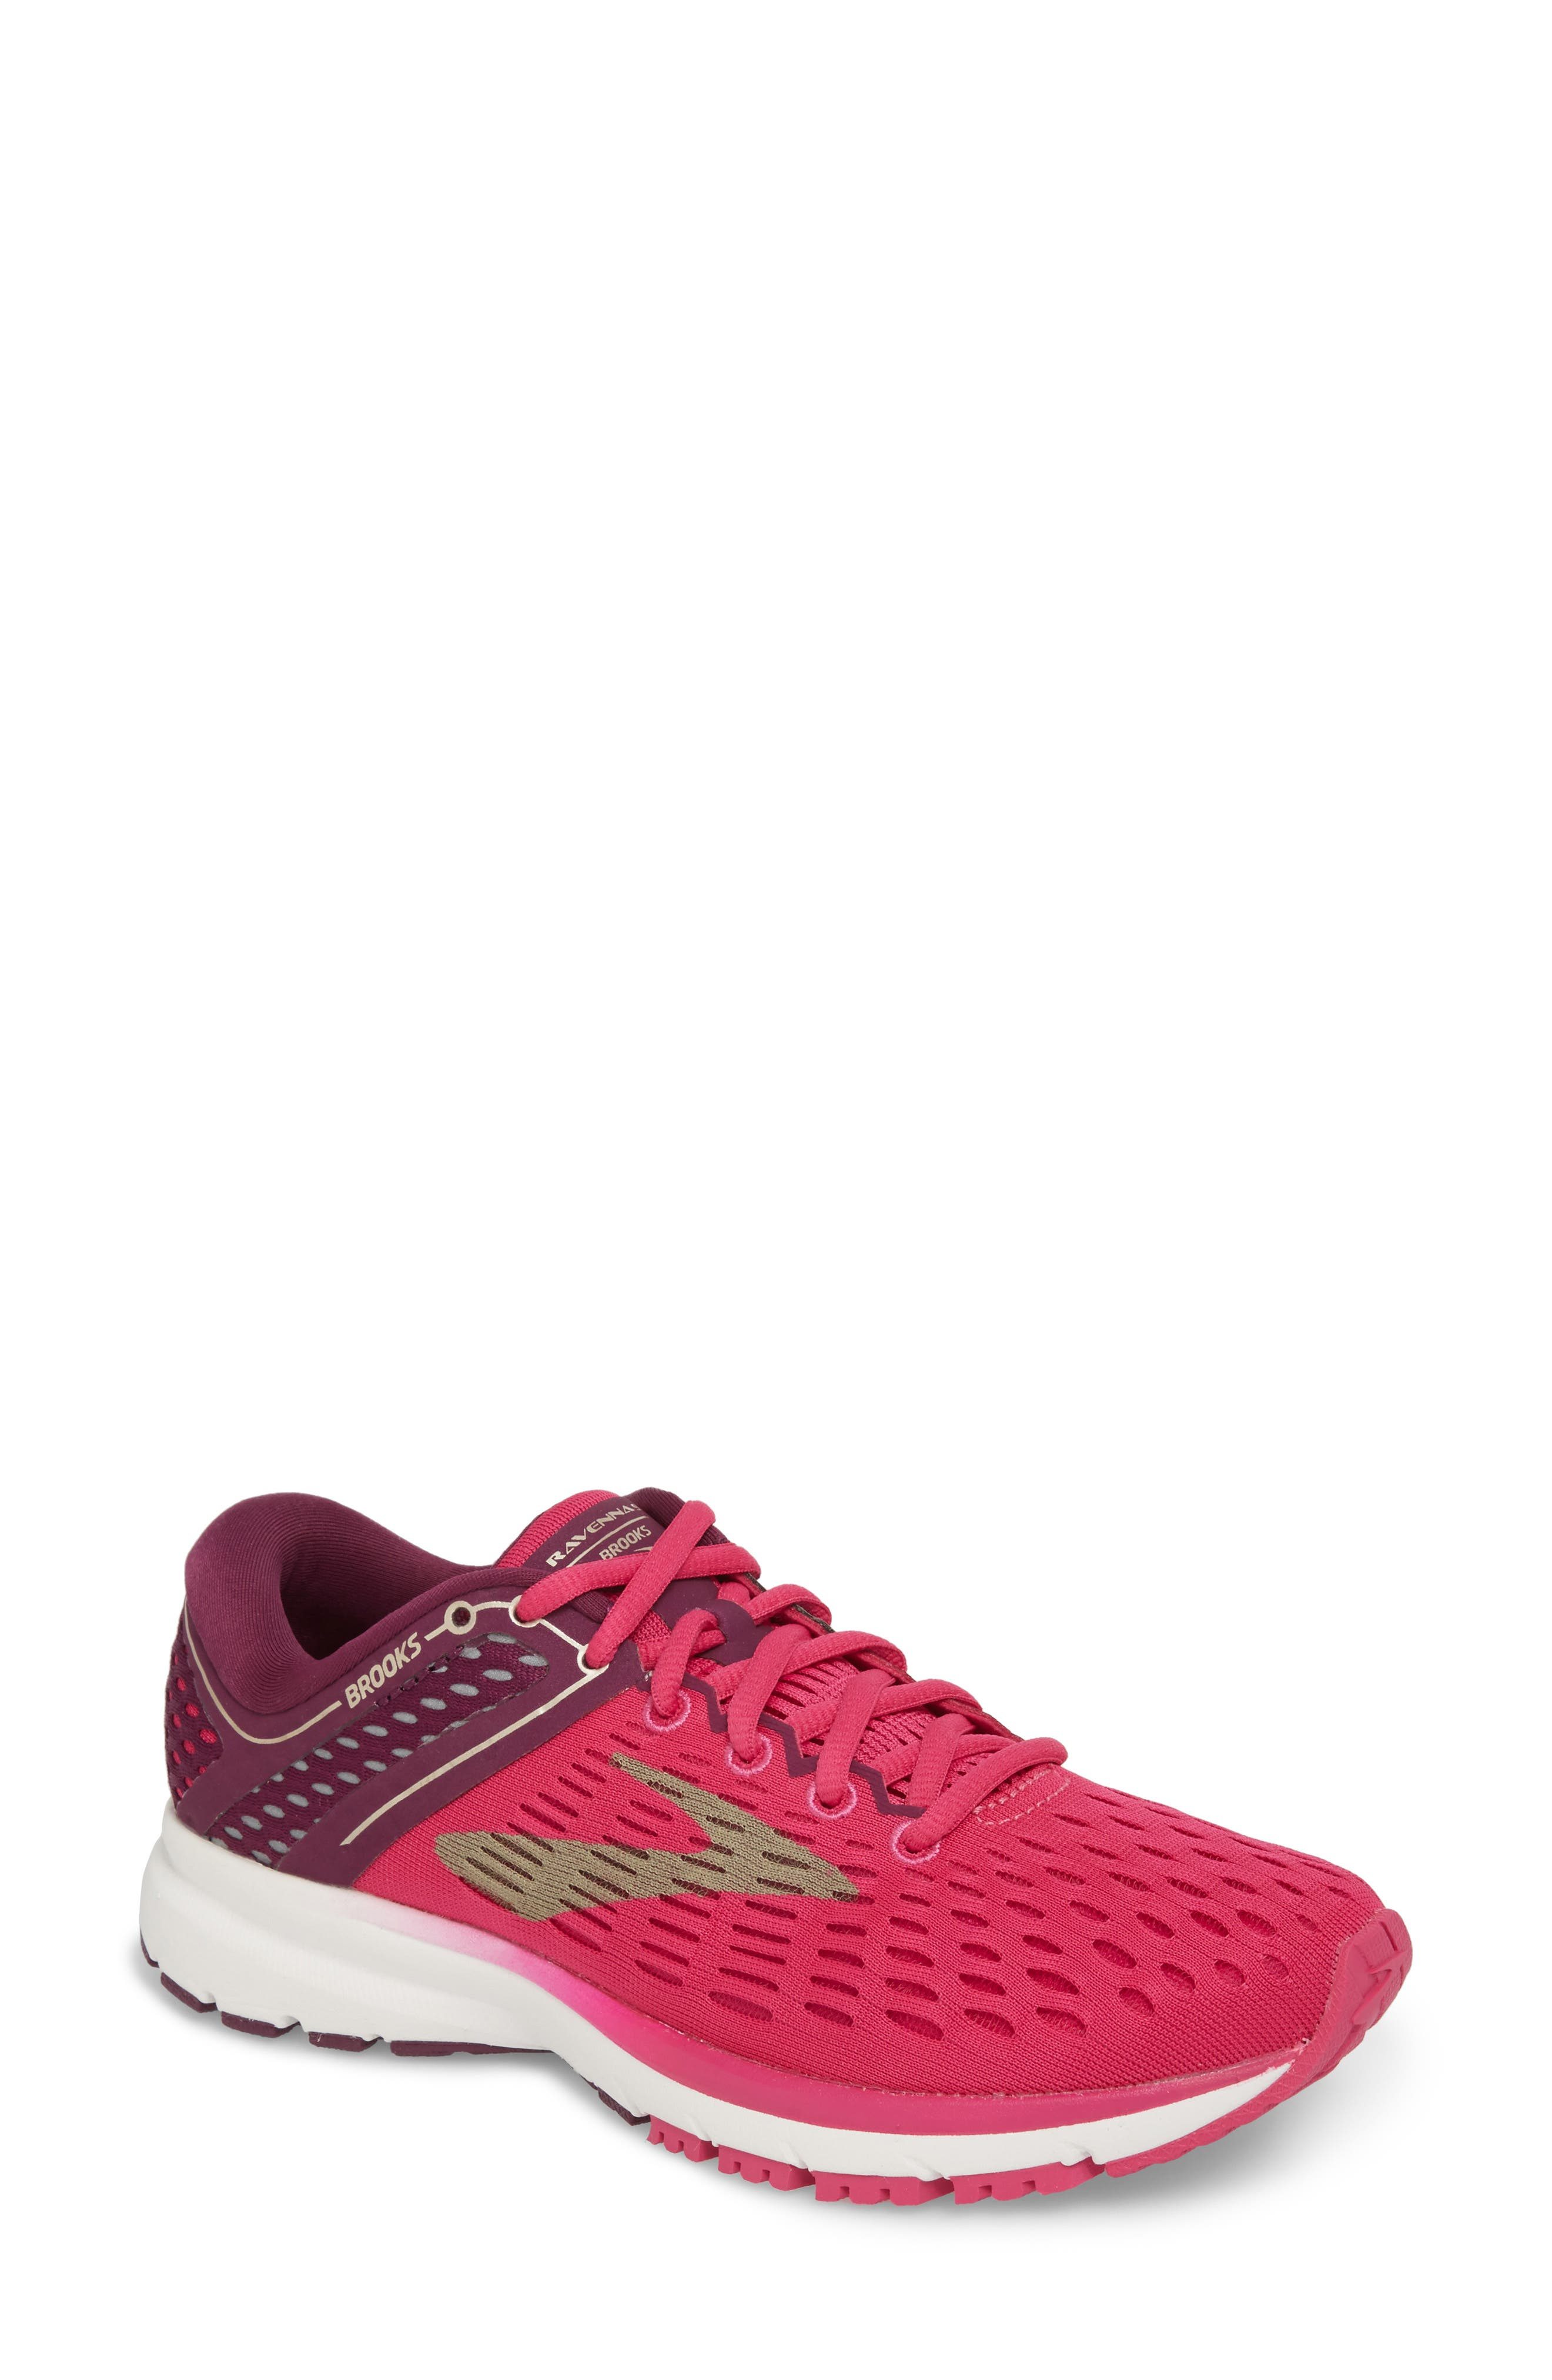 Brooks Ravenna 9 Running Shoe, Pink